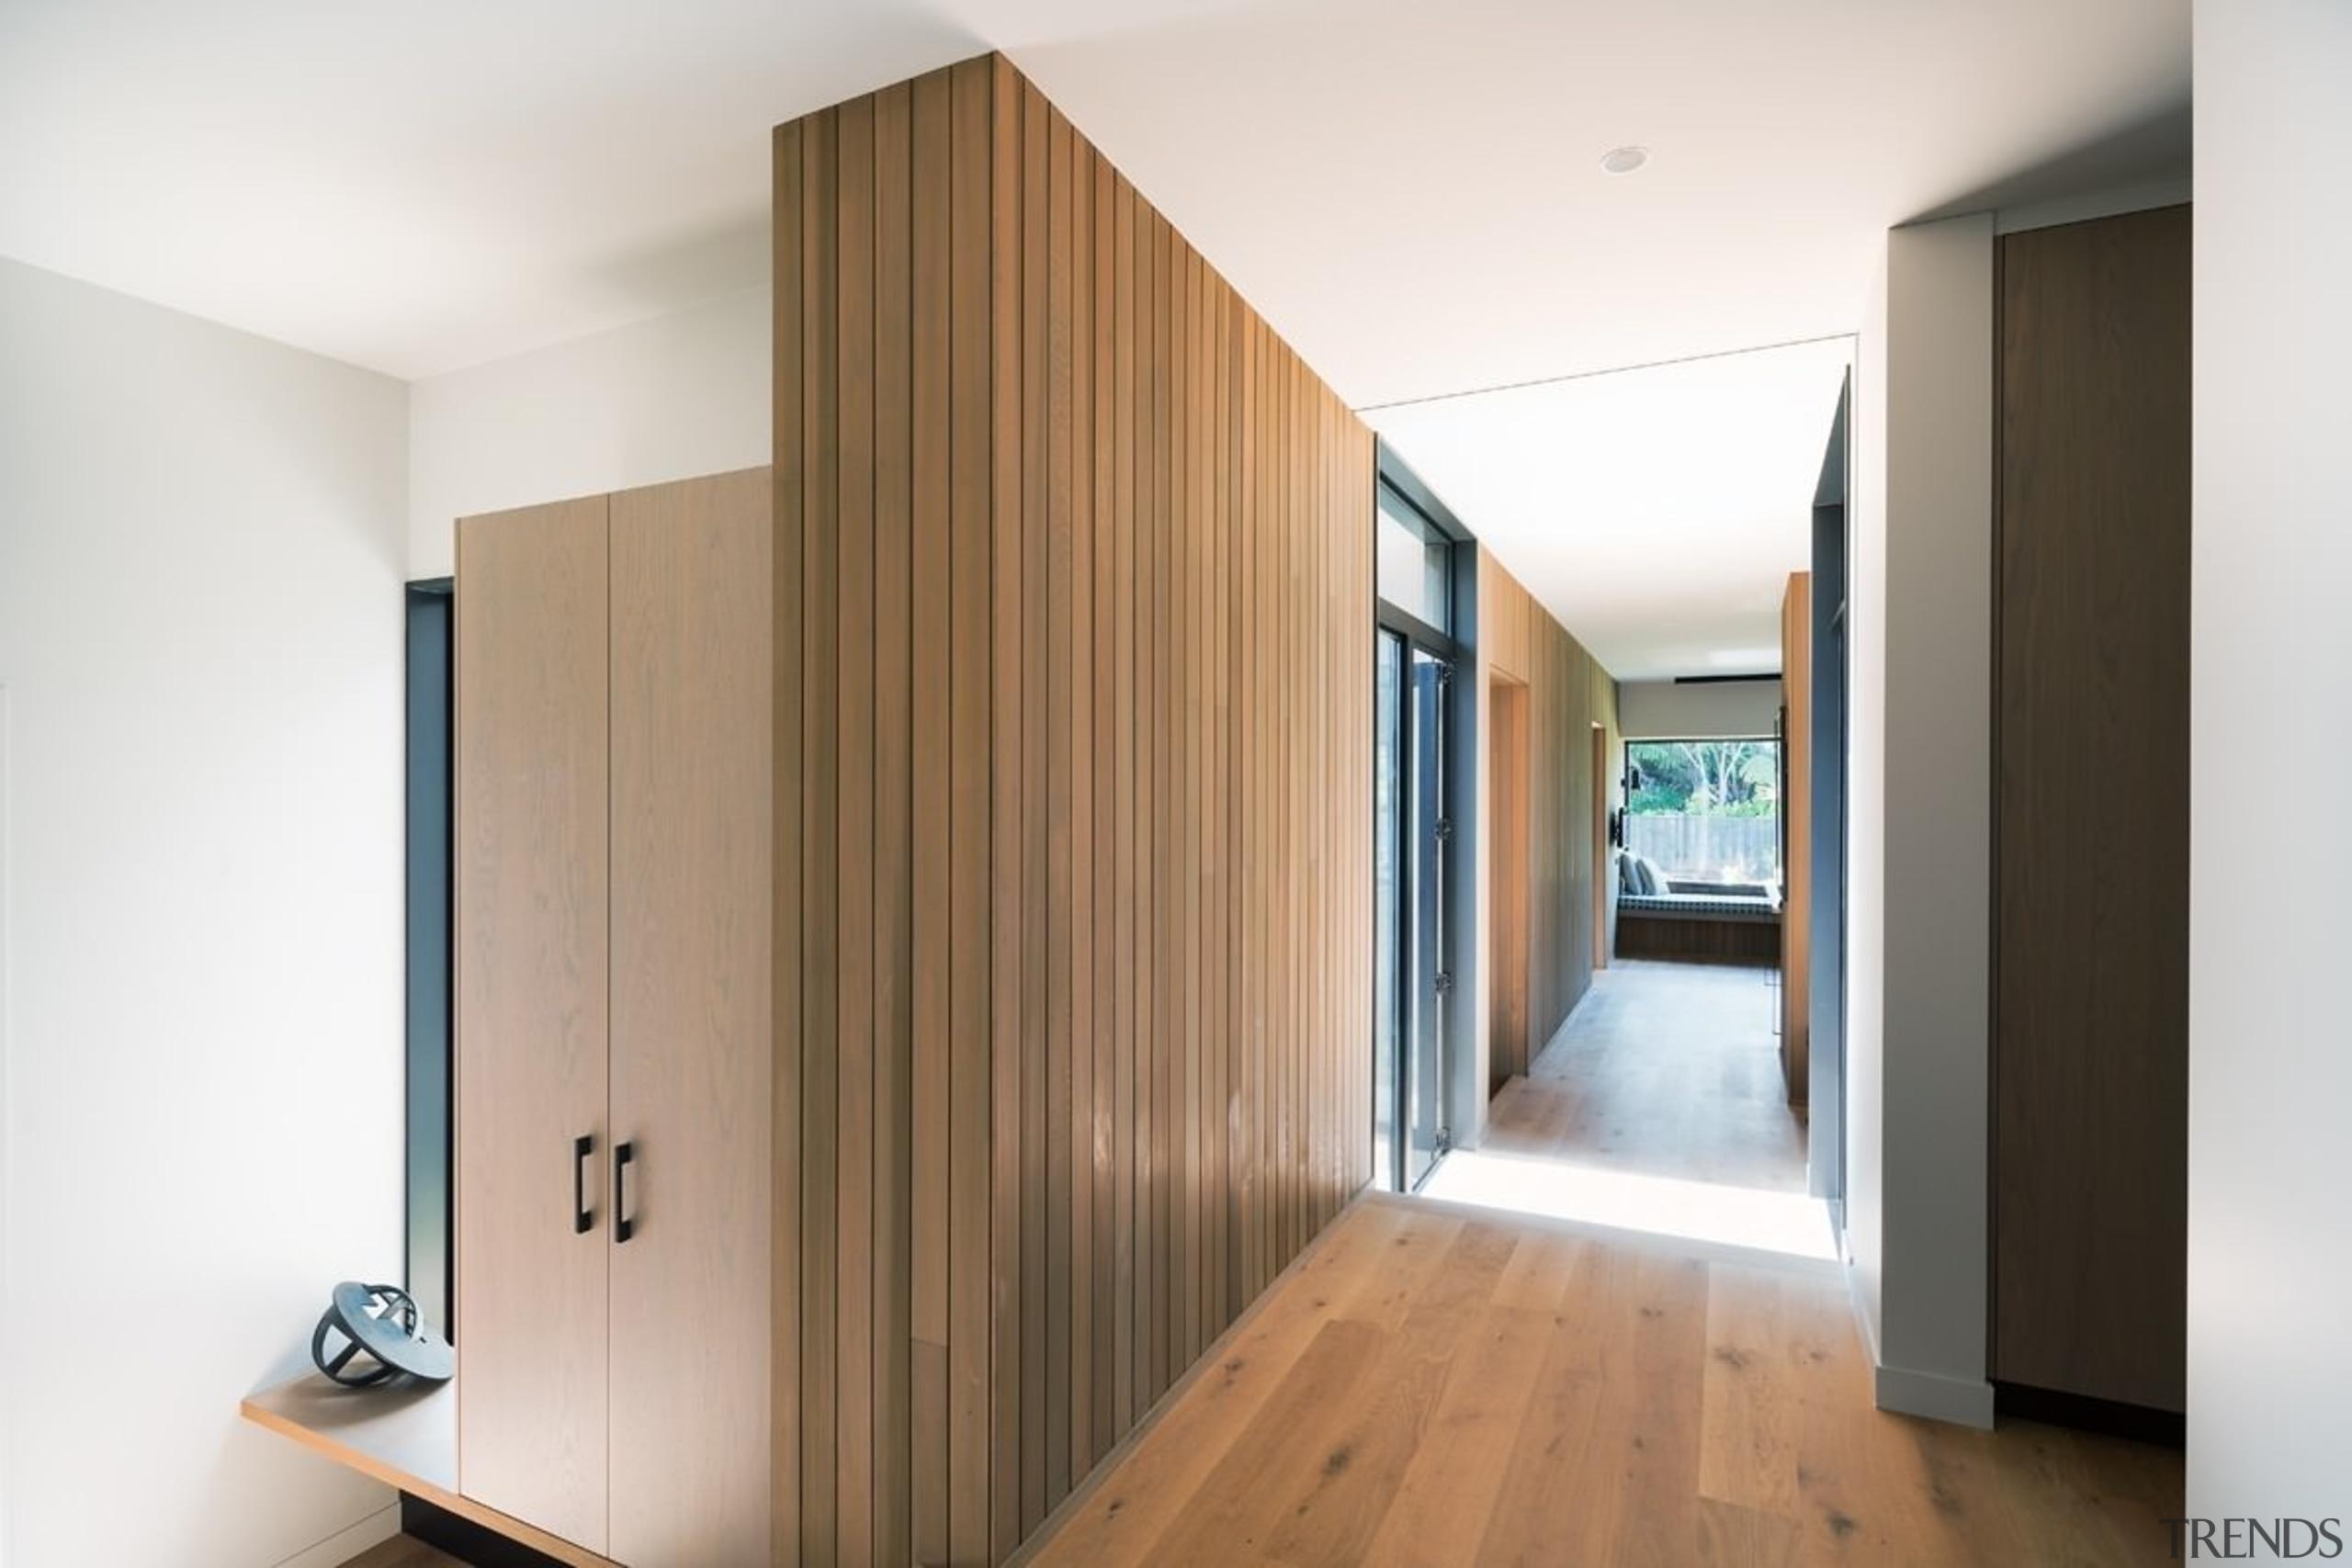 Cedar runs inside and out - Cedar runs architecture, floor, flooring, hardwood, house, interior design, real estate, room, wood, wood flooring, white